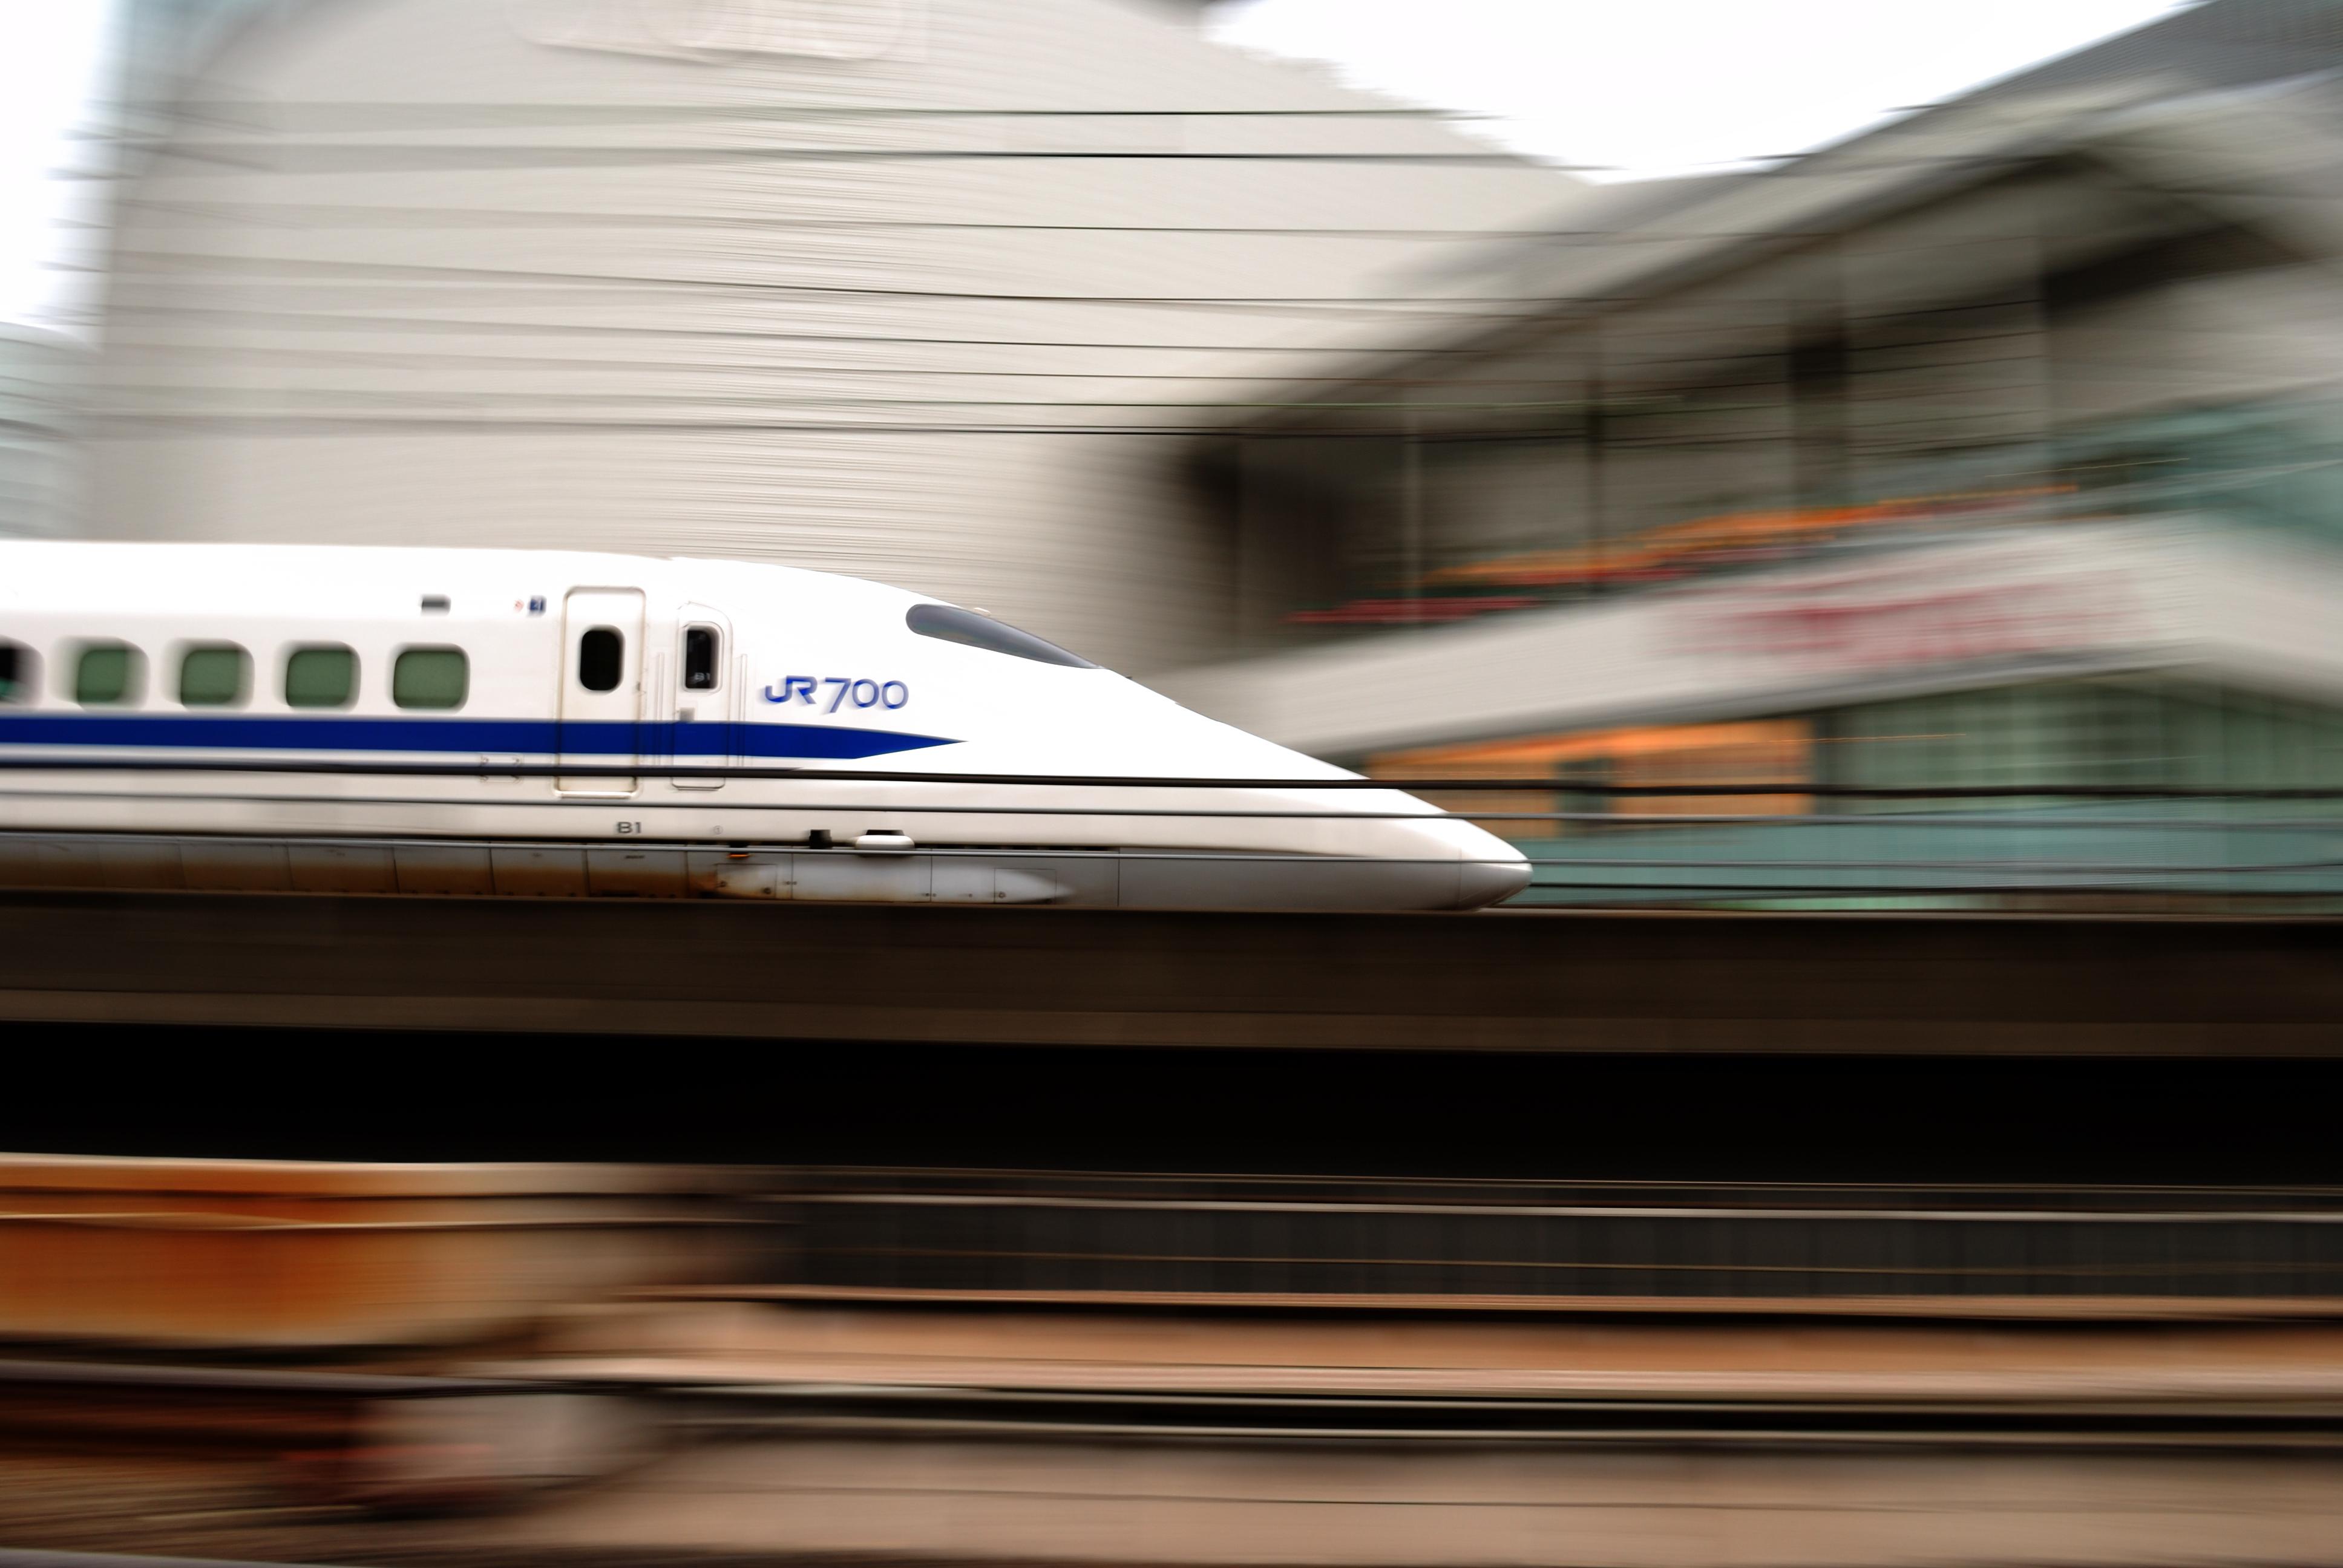 File:Shinkansen tokyo jpg - Wikimedia Commons